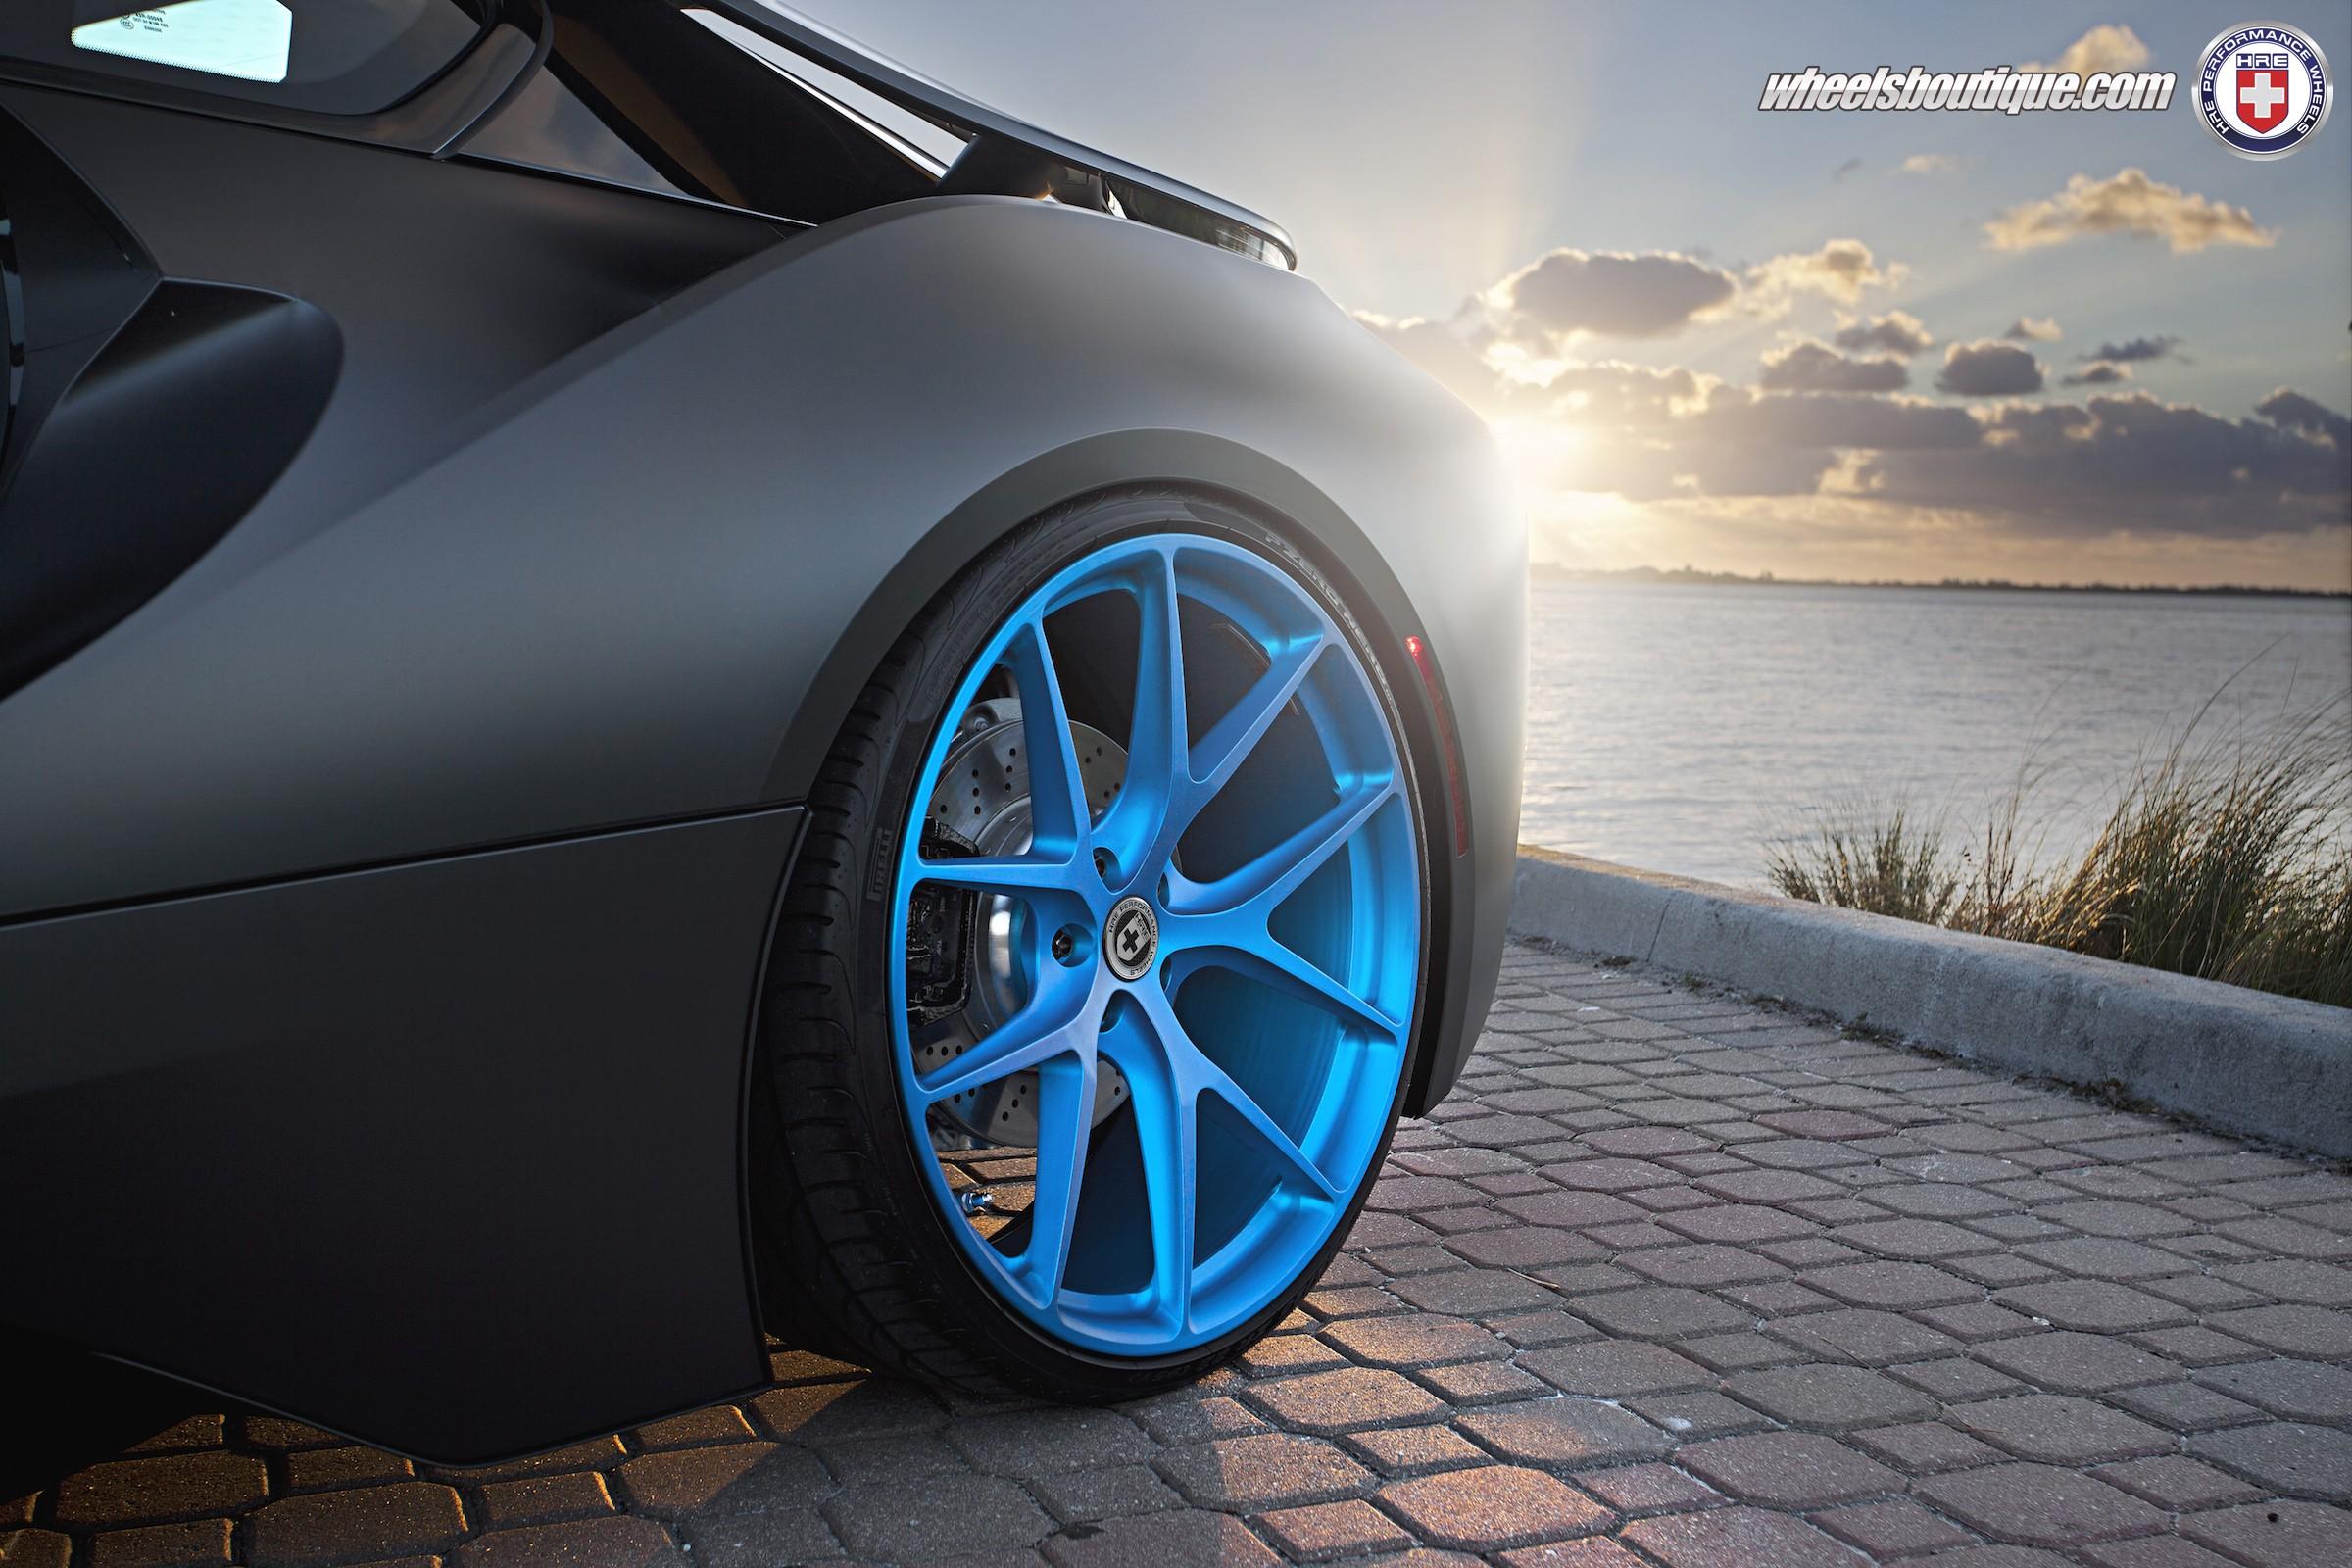 Matte Black BMW >> Break the Internet: The BMW i8 Edition - autoevolution